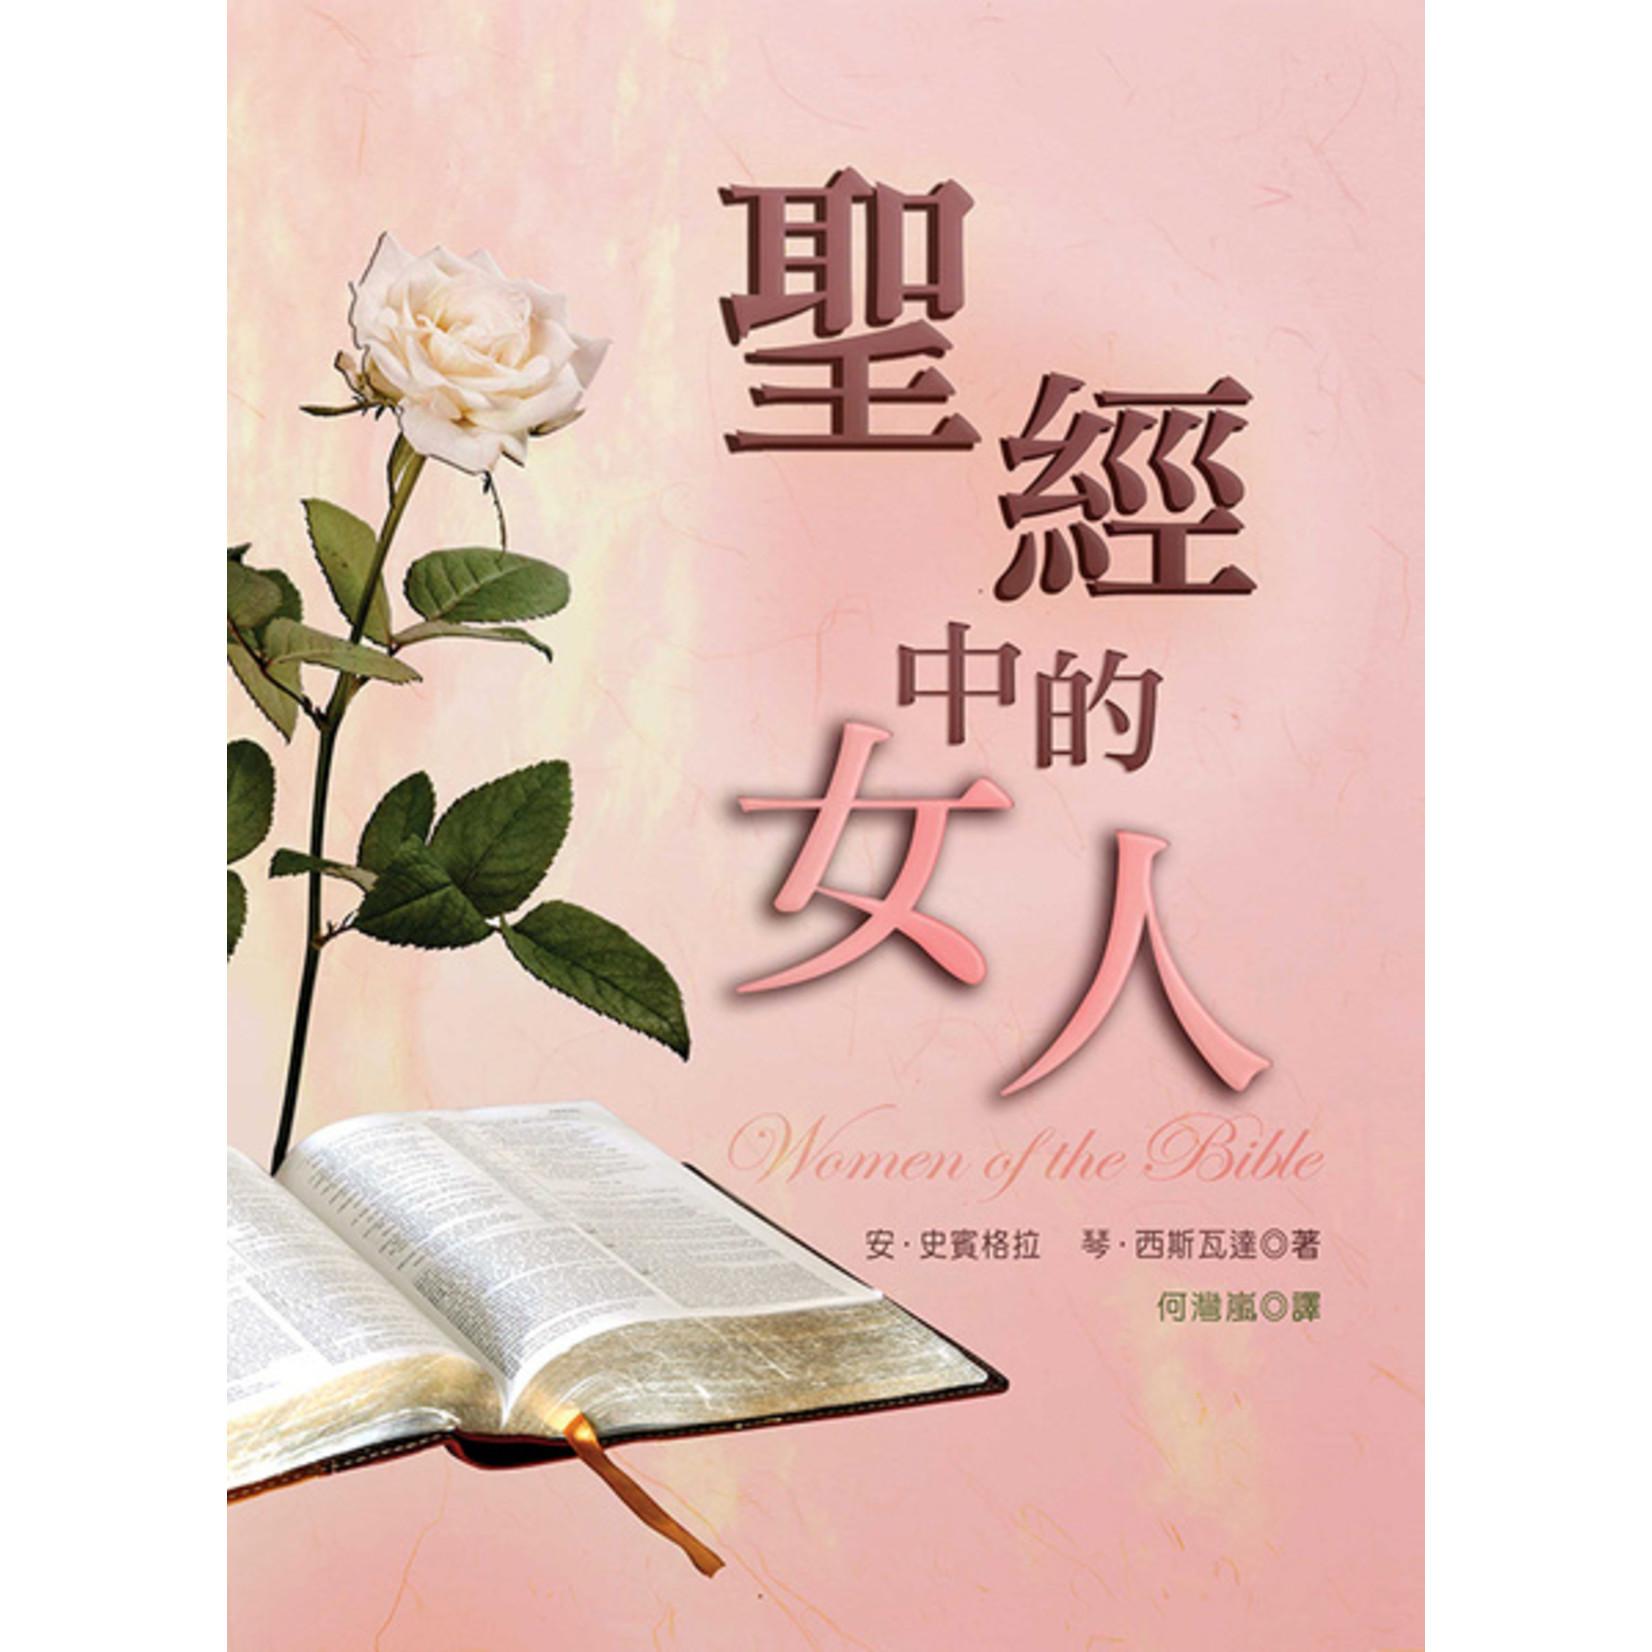 道聲 Taosheng Taiwan 聖經中的女人 Woman of the Bible